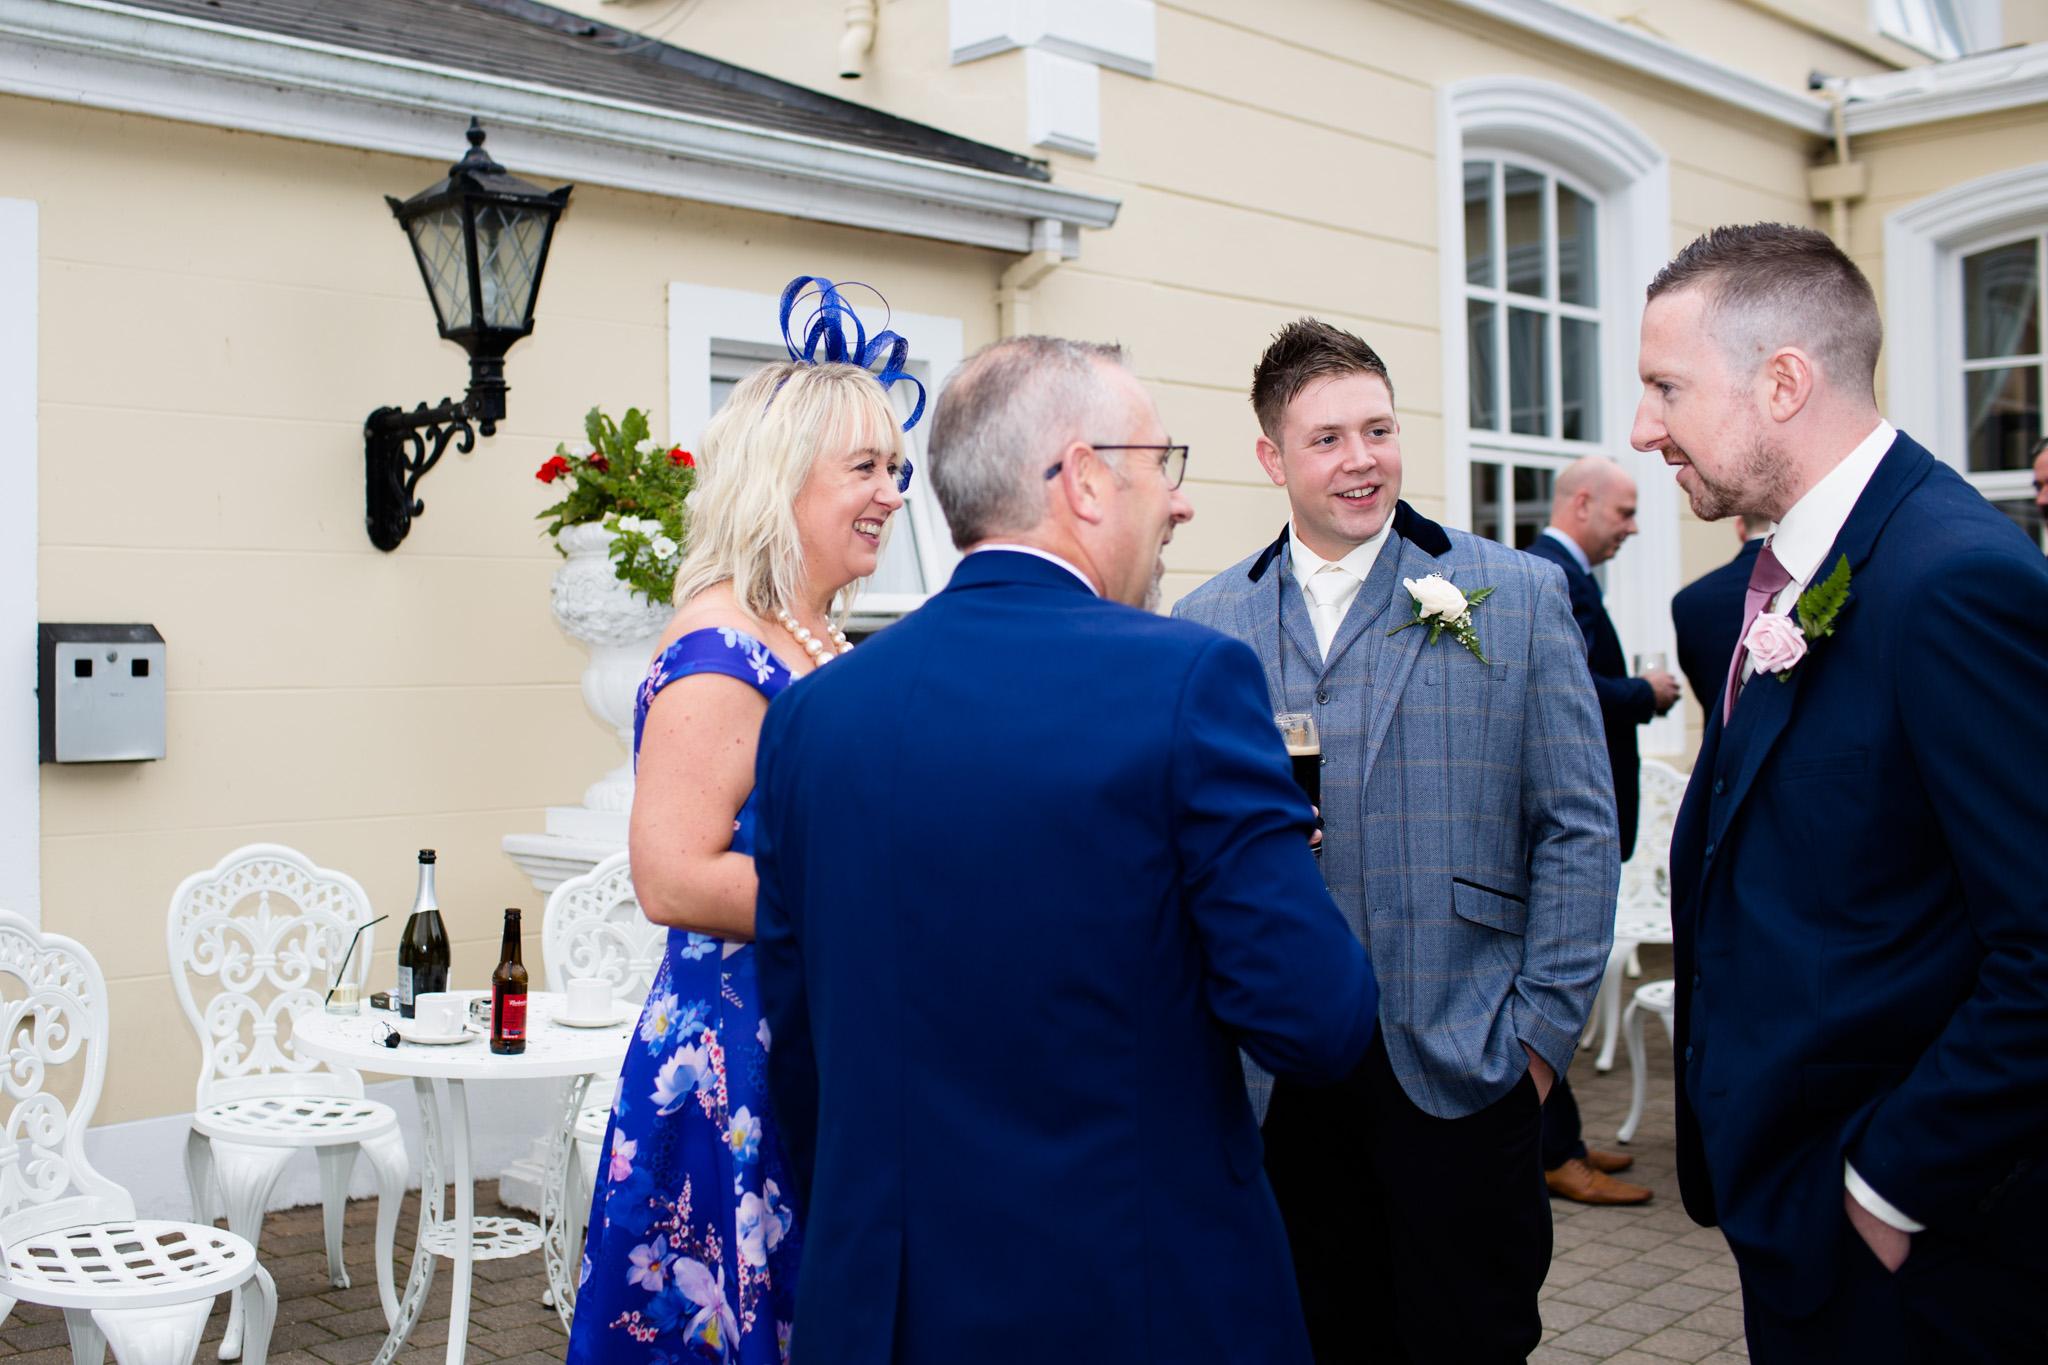 Mark_Barnes_Northern_Ireland_Wedding_Photography_Leighinmohr-house-hotel-ballymena_Wedding_Photography-53.jpg